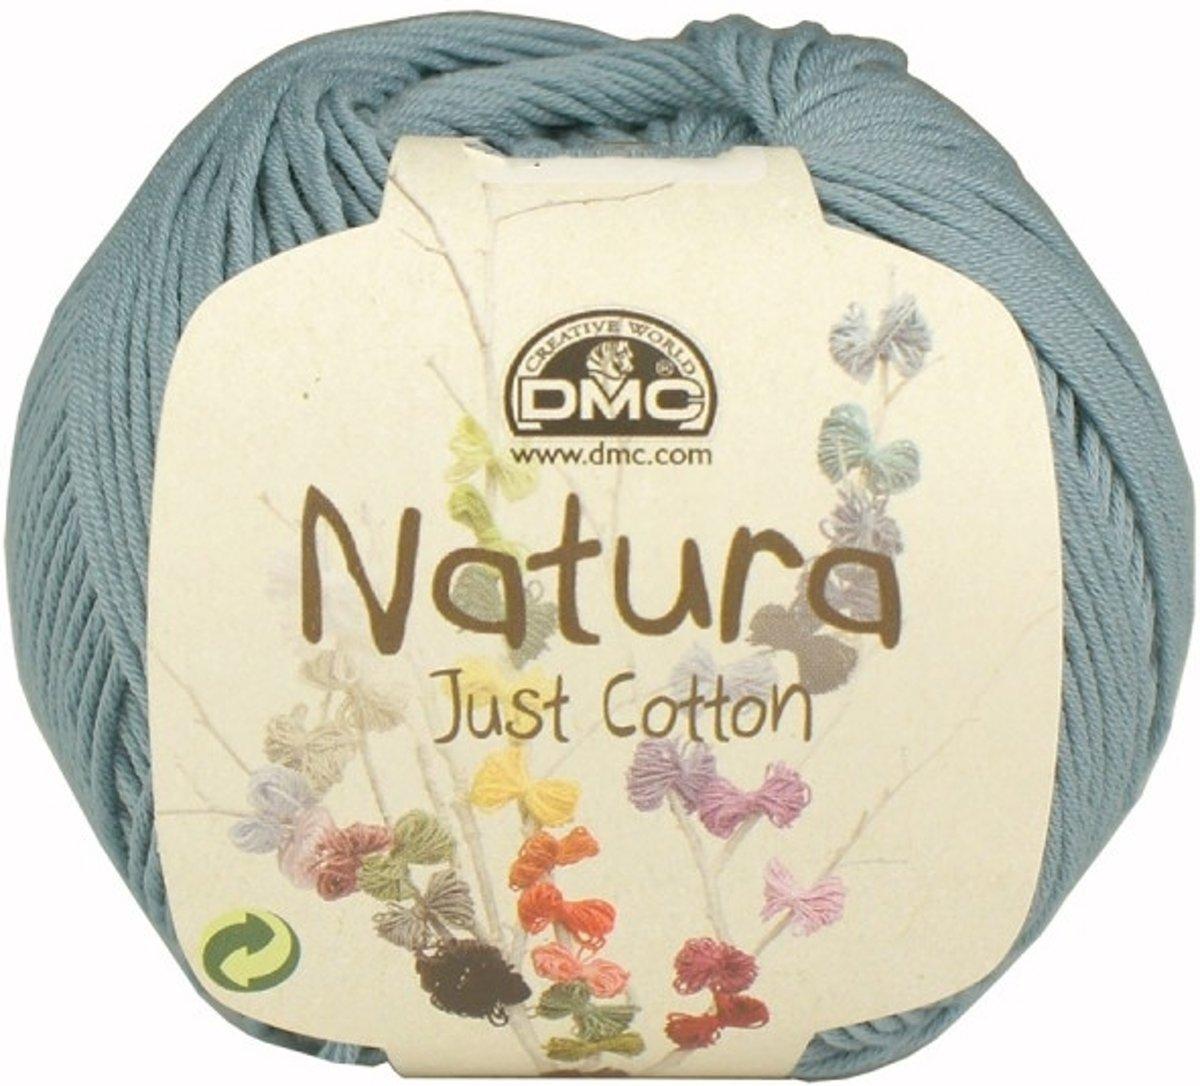 DMC Natura Just Cotton N56 Azur. PAK MET 10 BOLLEN a 50 GRAM. KL.NUM. 31. kopen